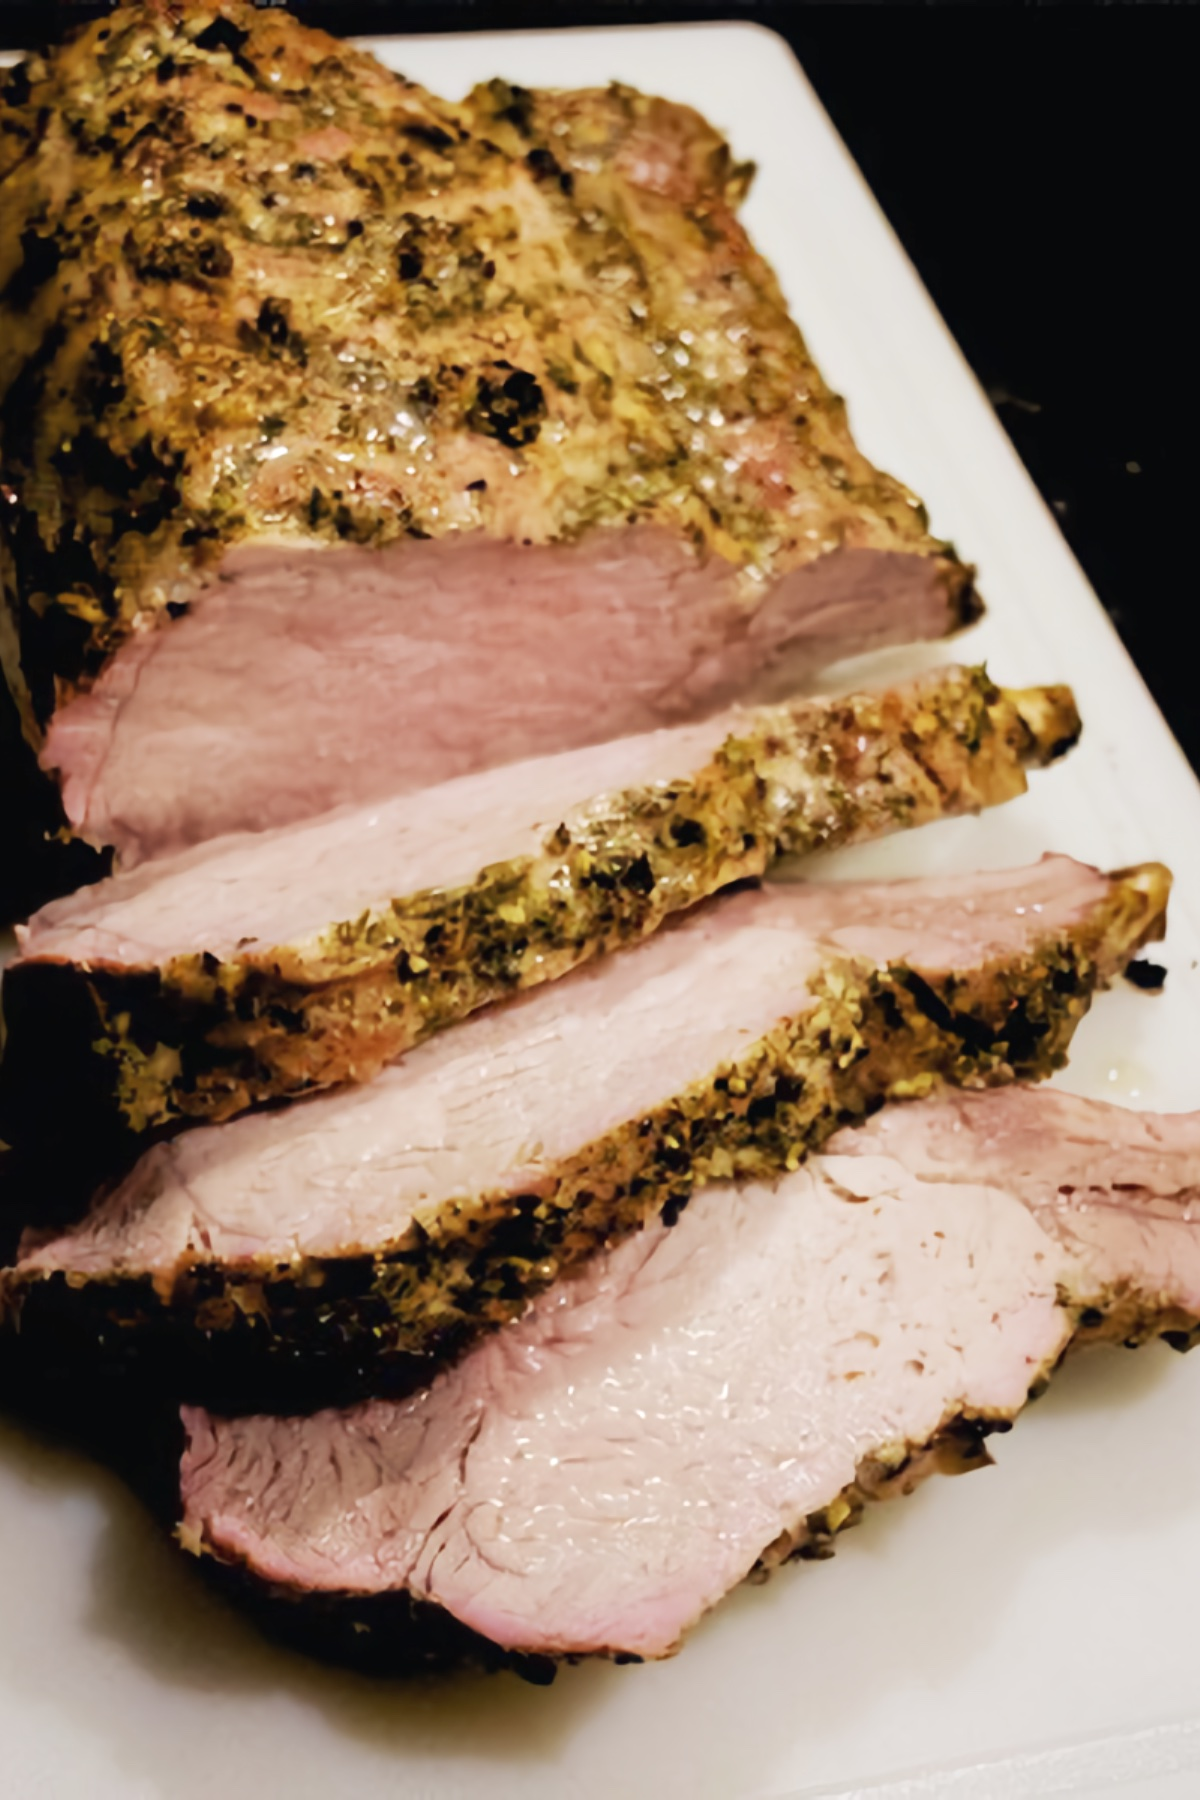 Herb-Roasted Rack of Pork sliced into huge chops on a cutting board.